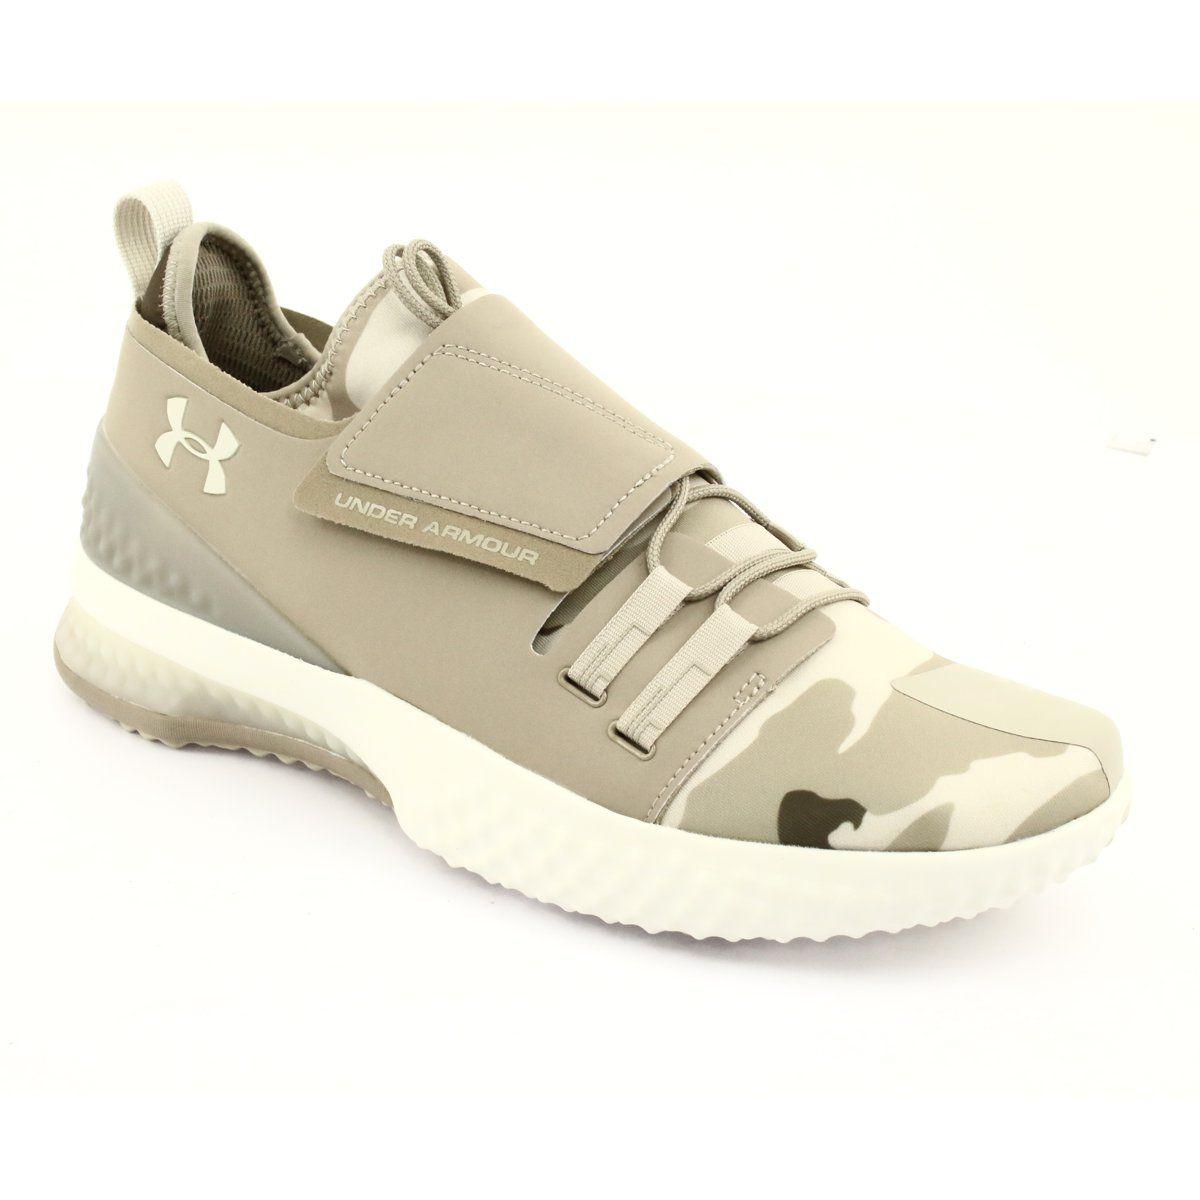 Buty Treningowe Under Armour Architech 3di Valor M 3000368 200 Brazowe Zielone Adidas Tubular Adidas Tubular Defiant Sneakers